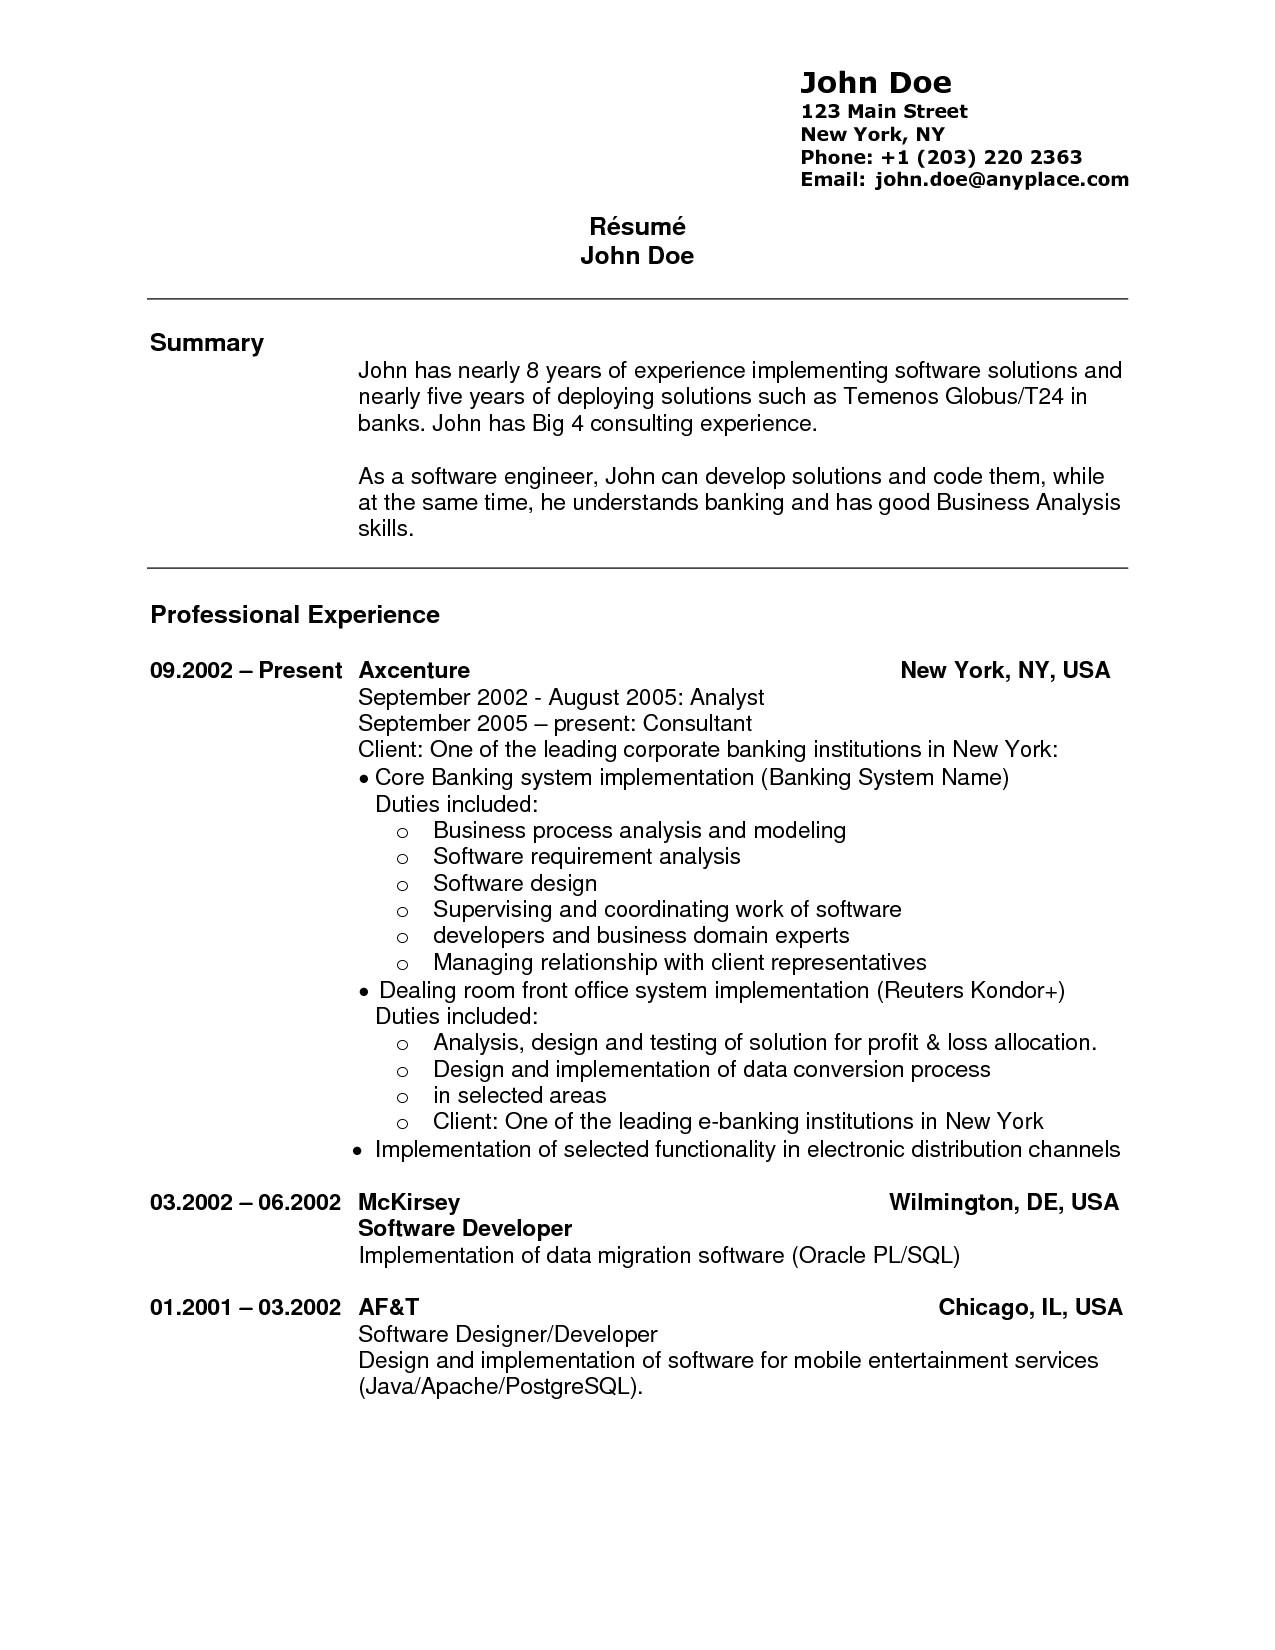 resume experience 893